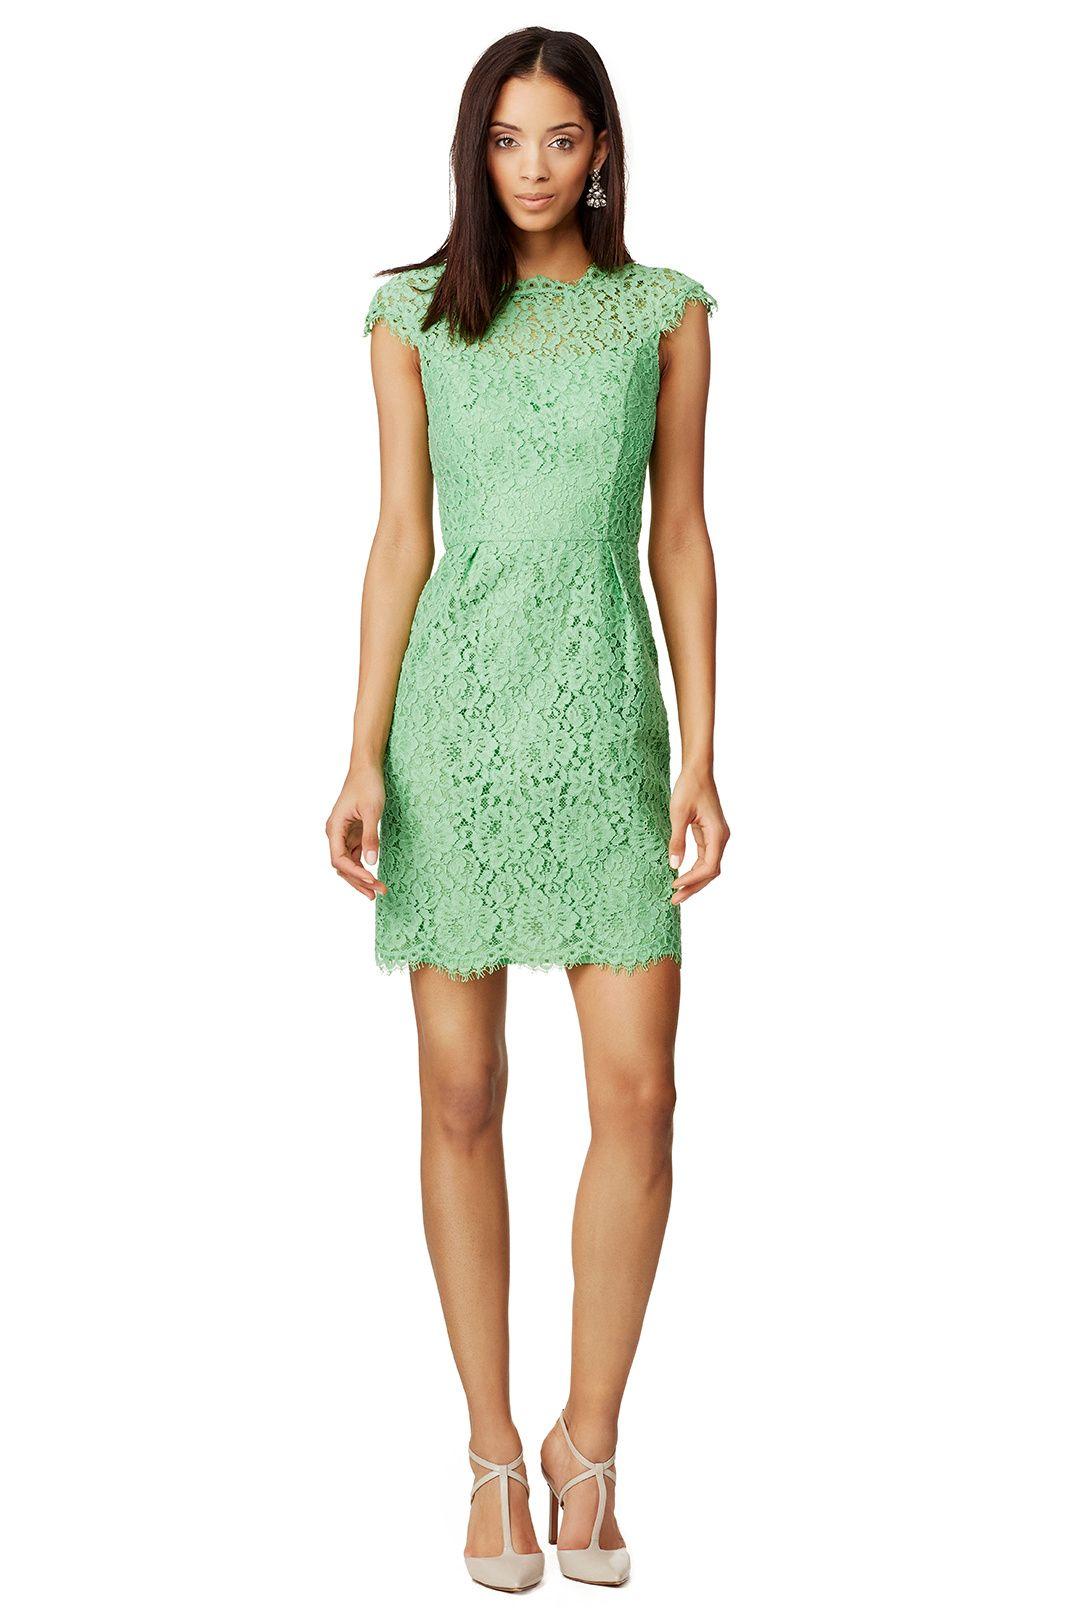 Black lace dress for summer wedding  Shoshanna Apple Olivia Dress RTR  BEAUTY Clothing  Pinterest